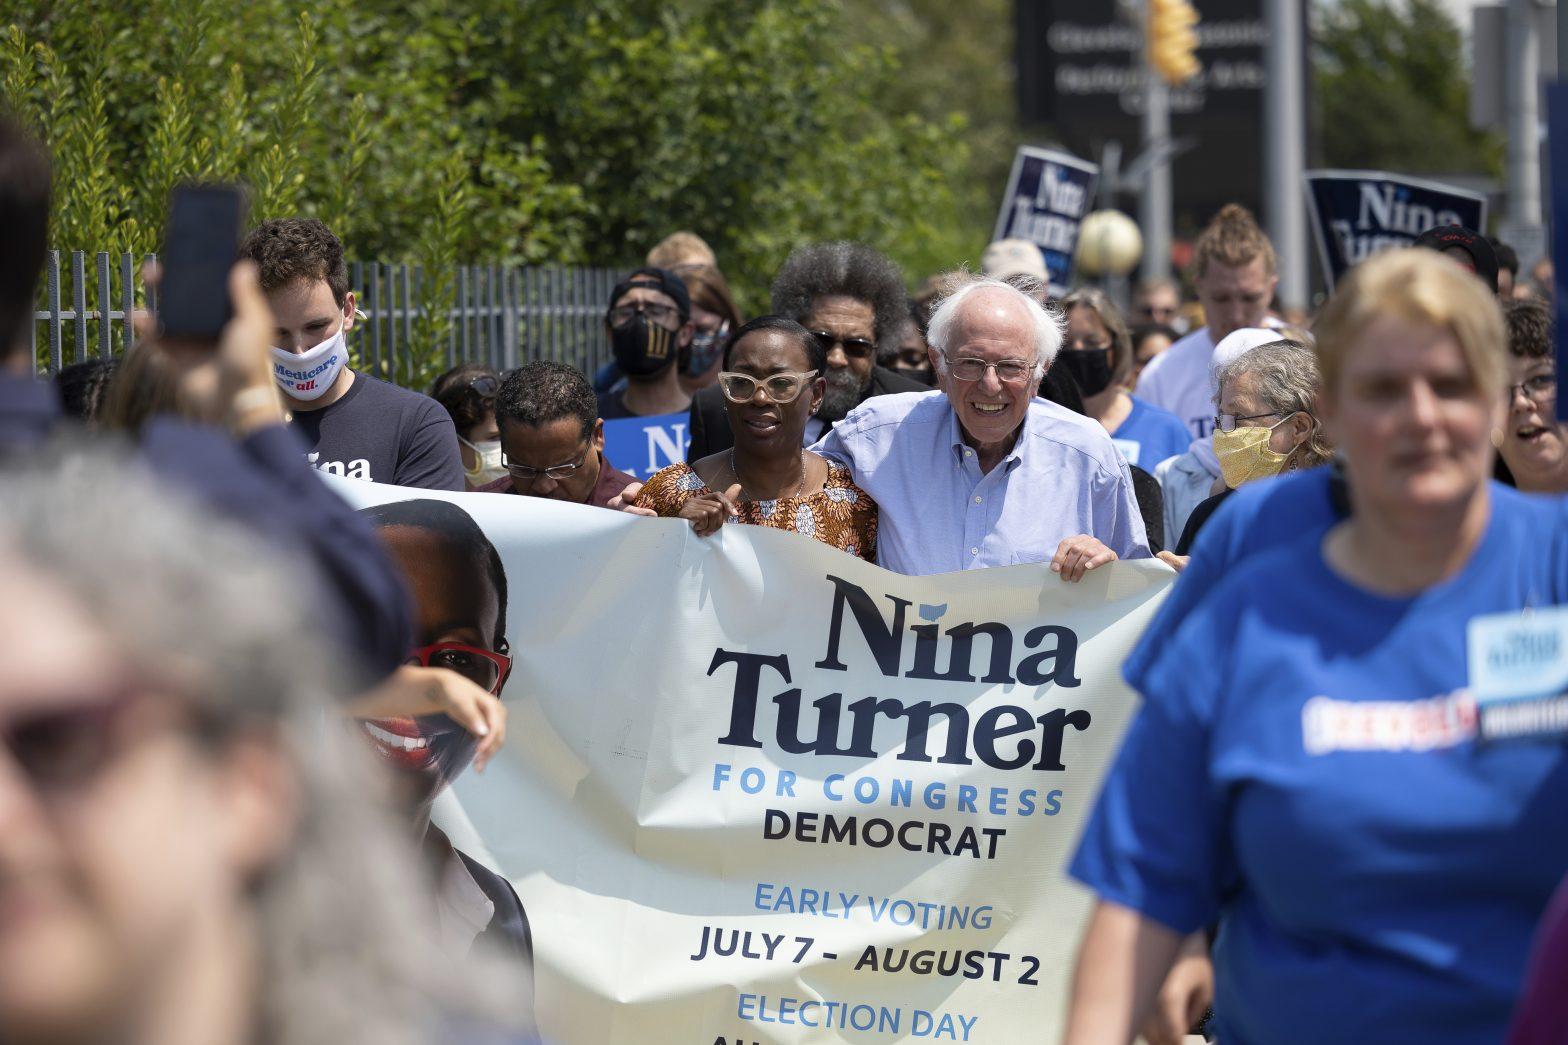 Nina Turner and Bernie Sanders